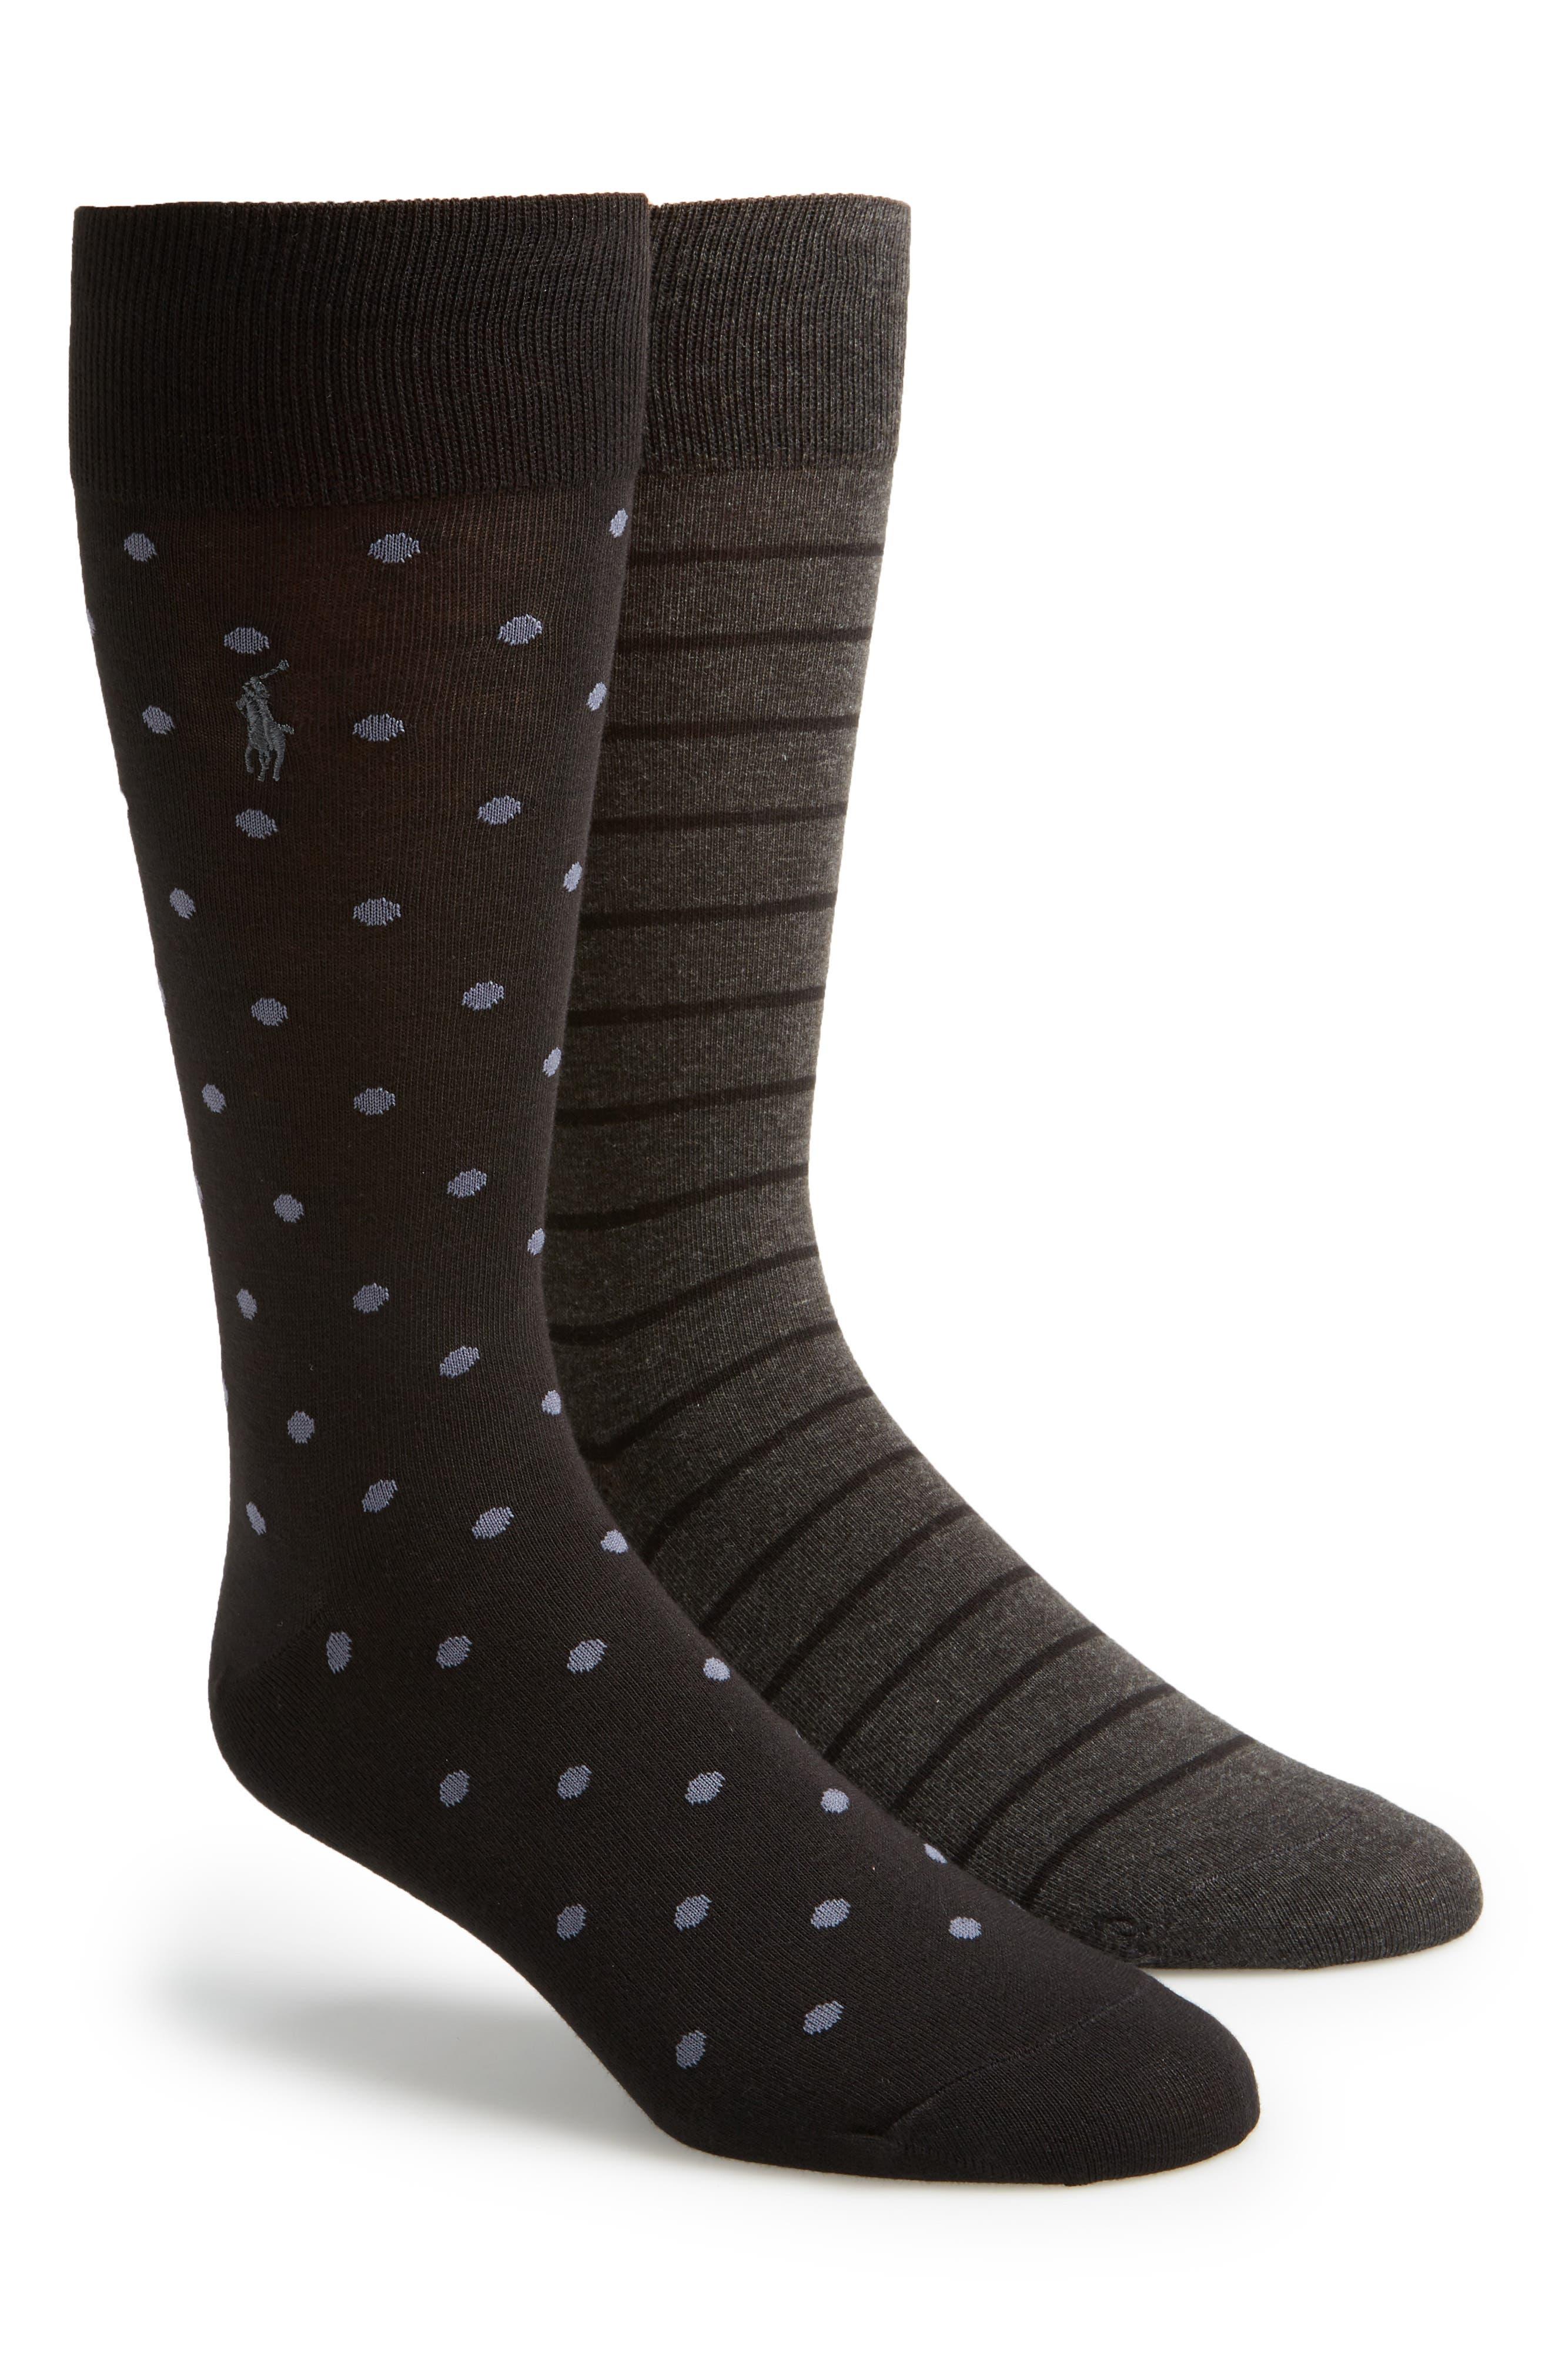 2-Pack Socks,                             Main thumbnail 1, color,                             Charcoal